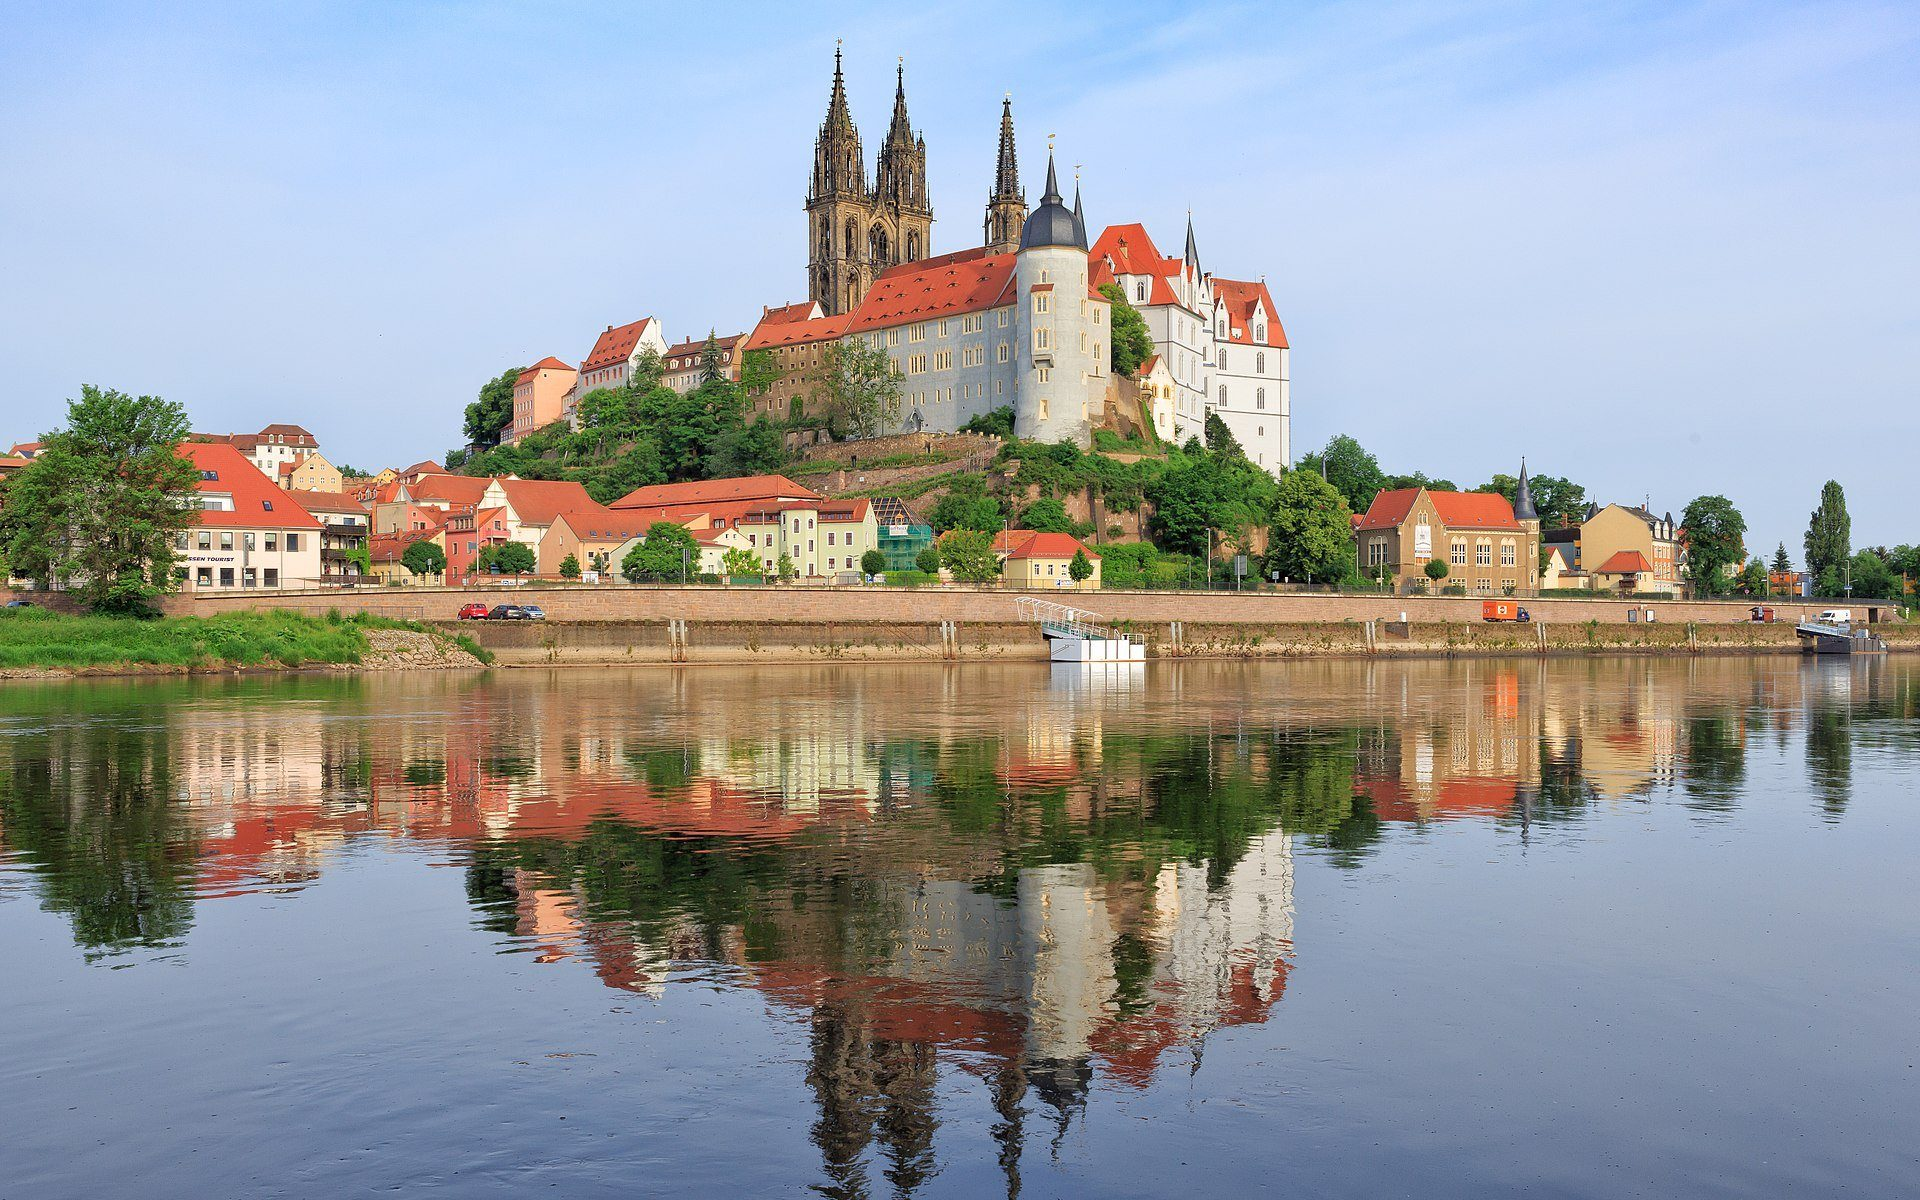 Meissen city